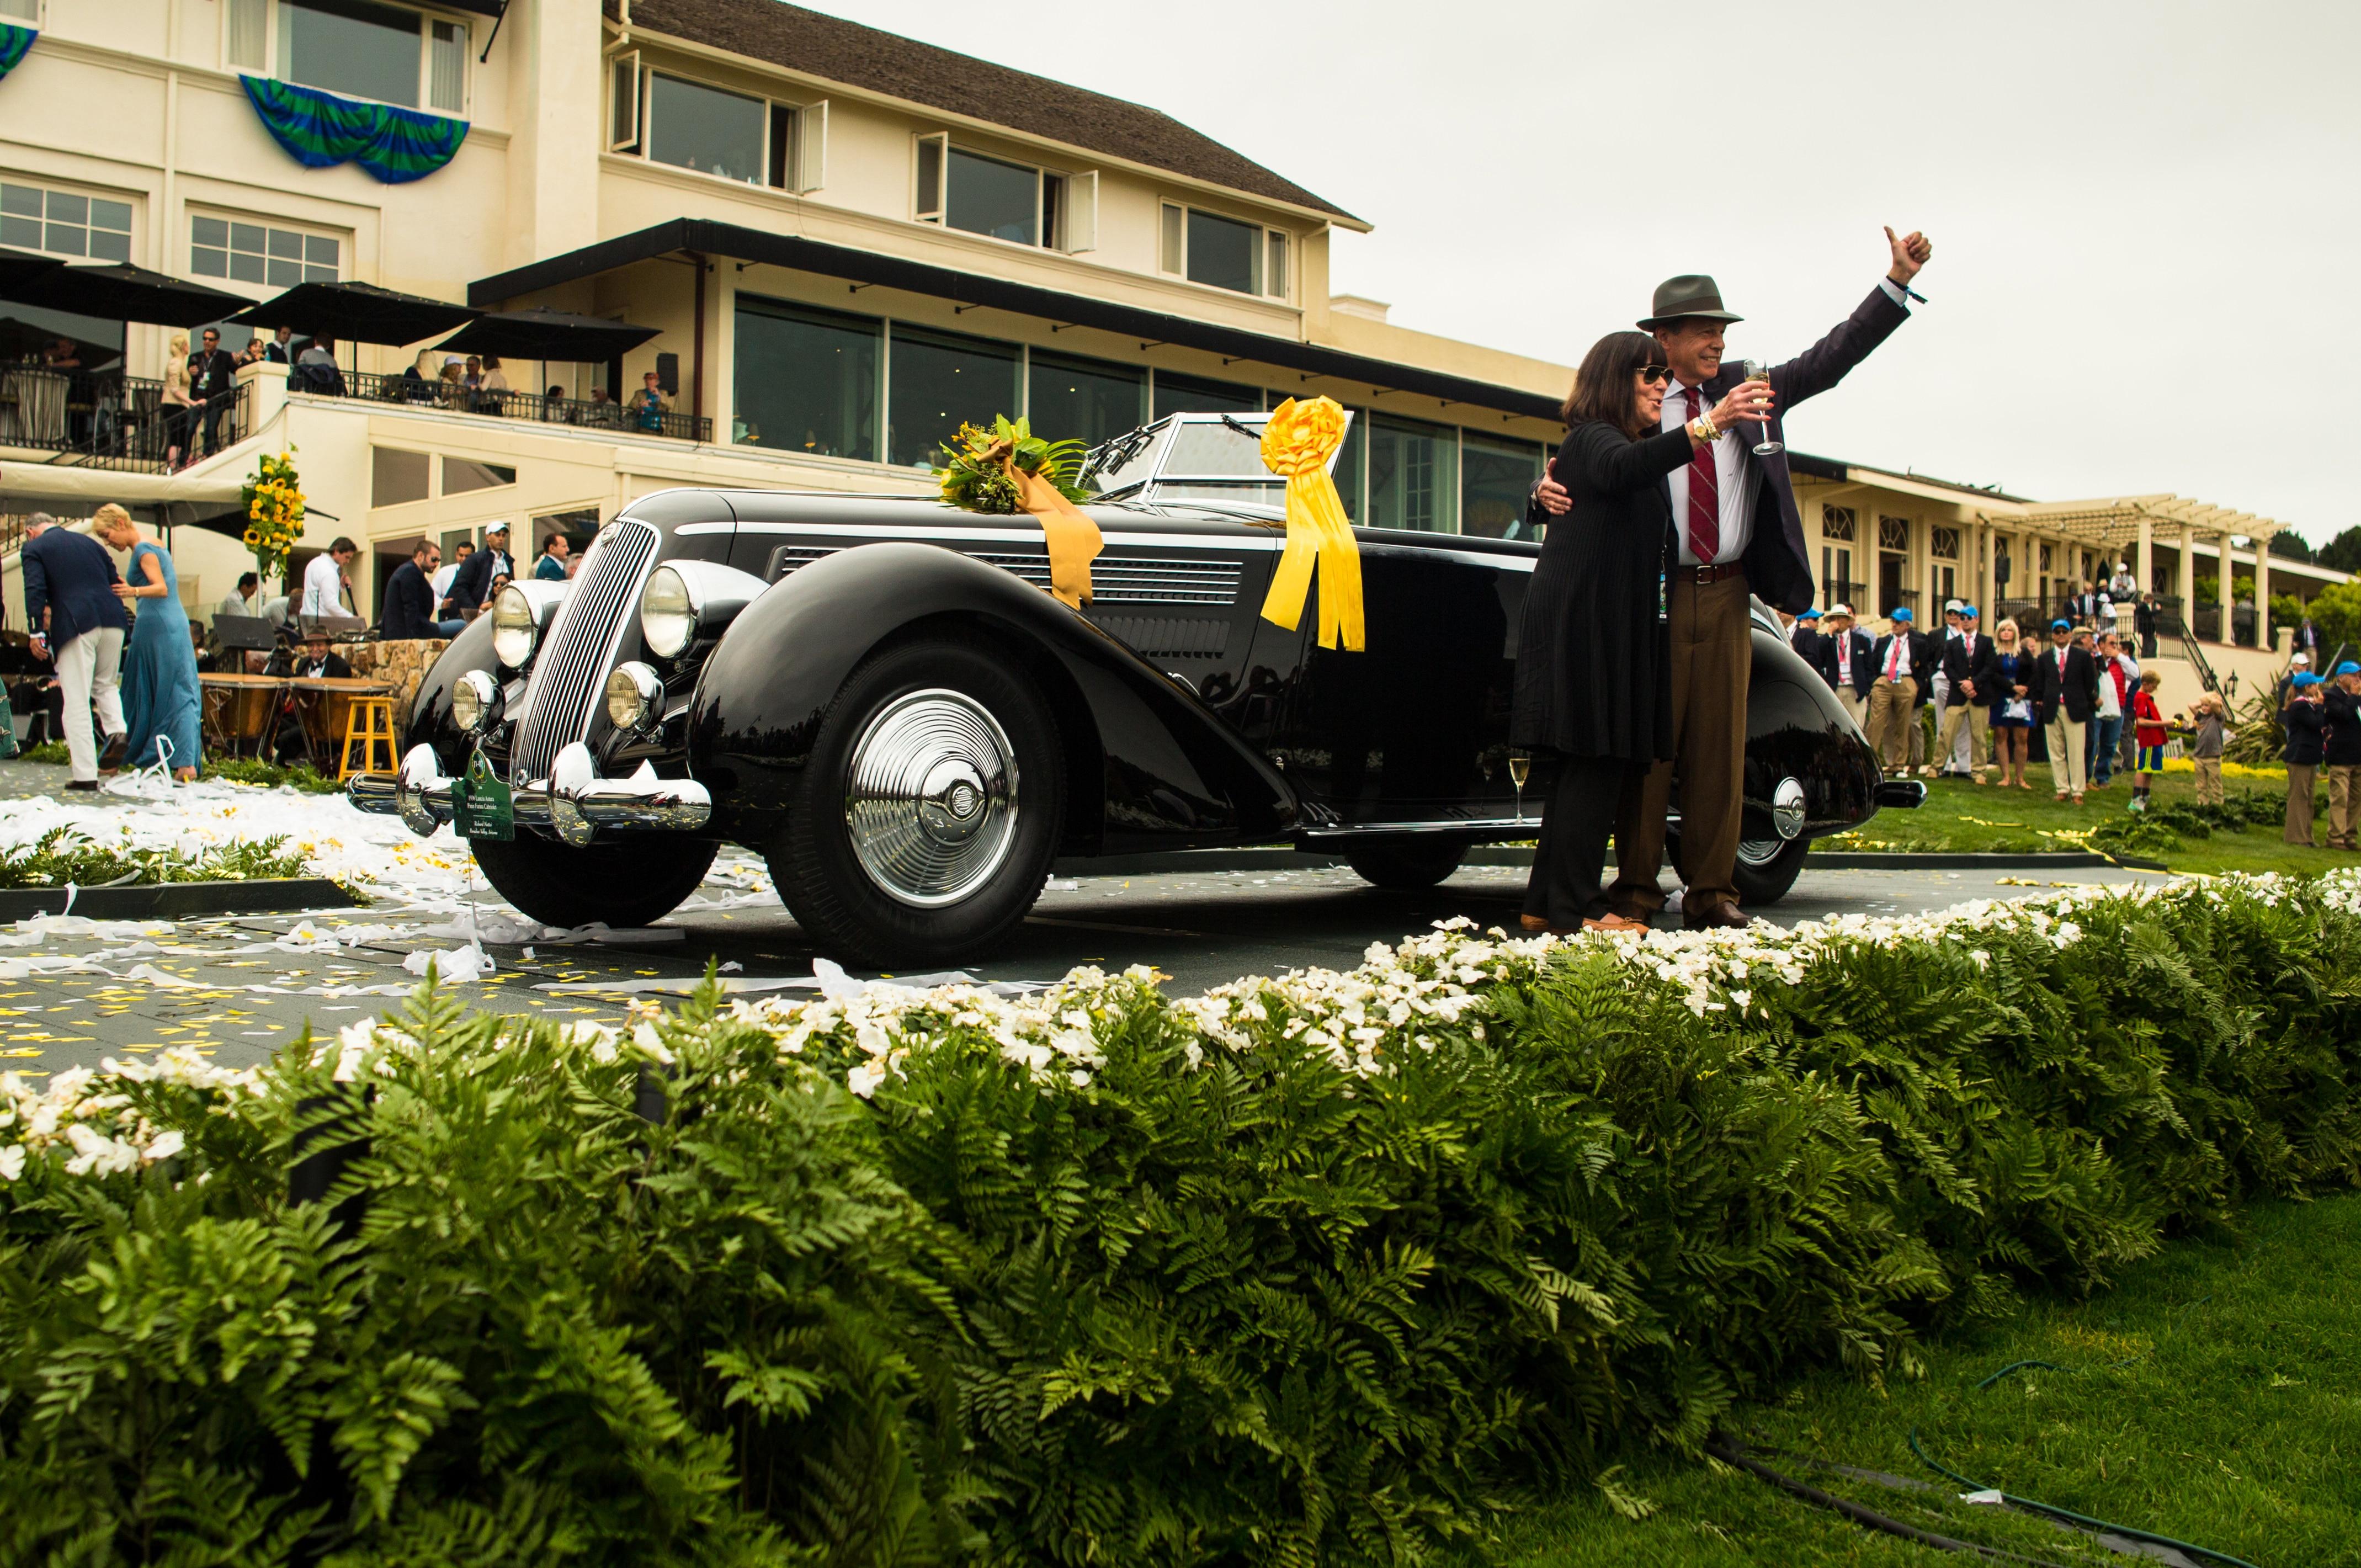 1936 Lancia Astura Pinin Farina Cabriolet Pebble Beach 2016 Best Of Show 1